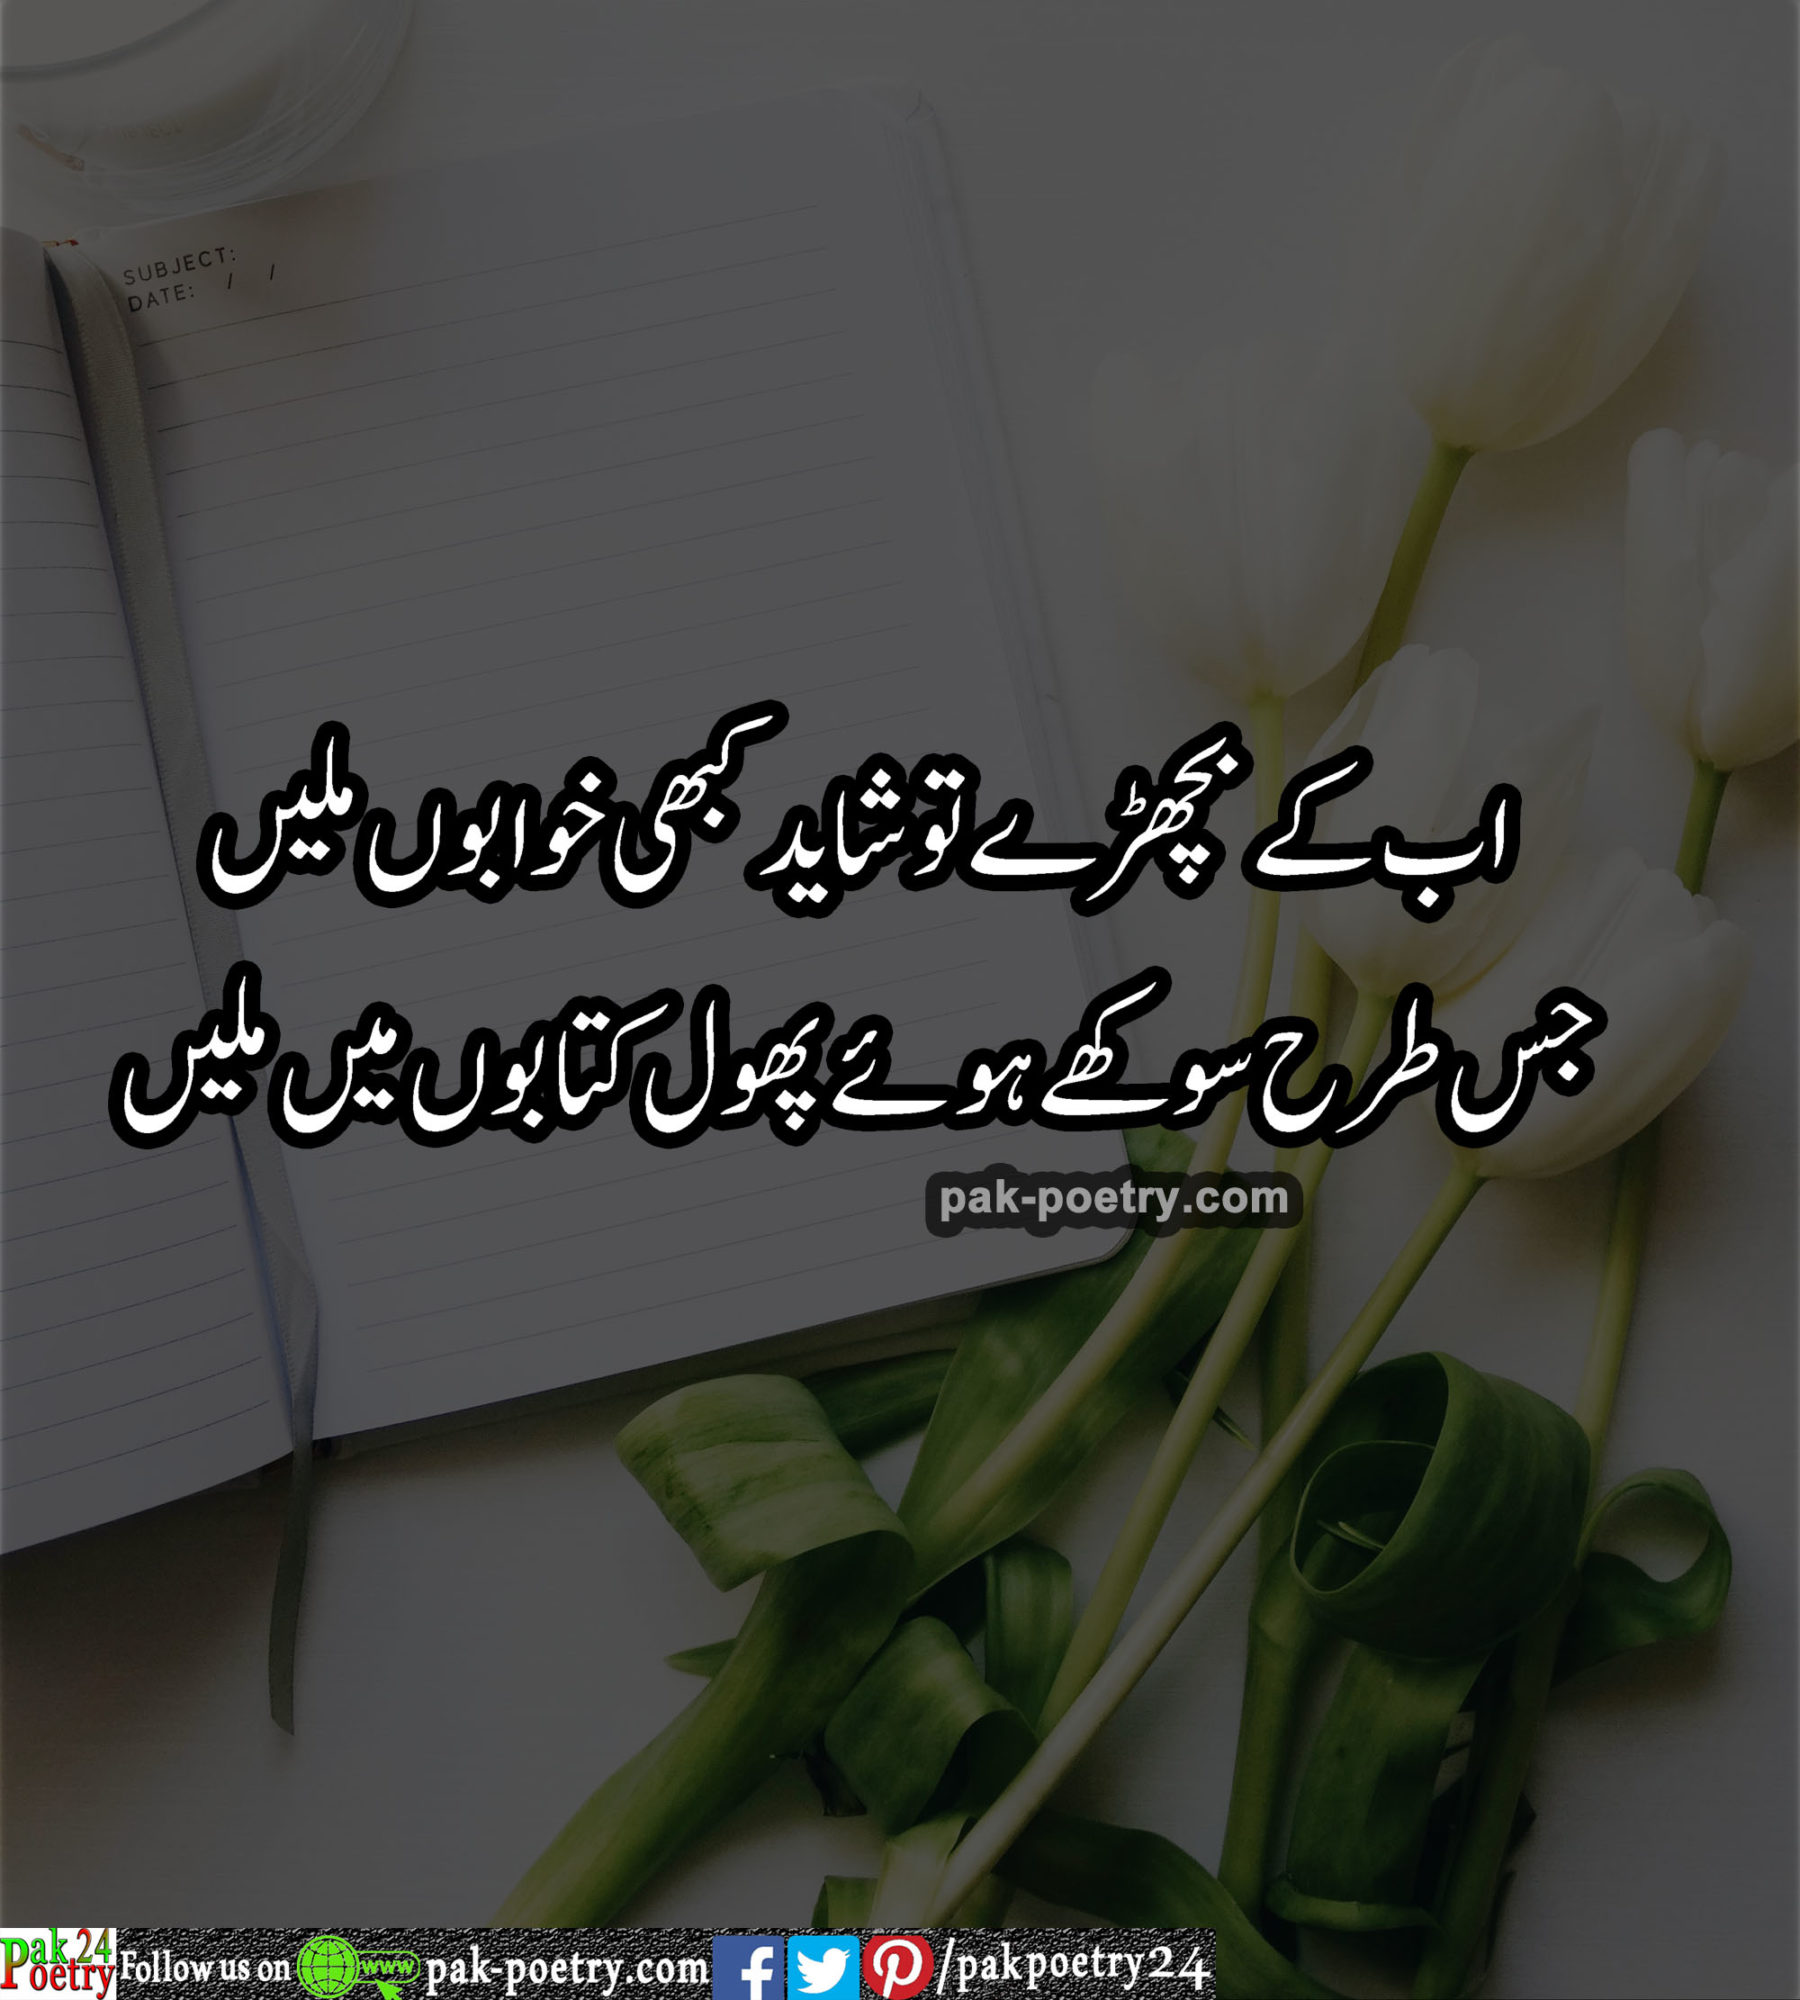 love poetry urdu - ab ky bichry shayed kbhi khawabon